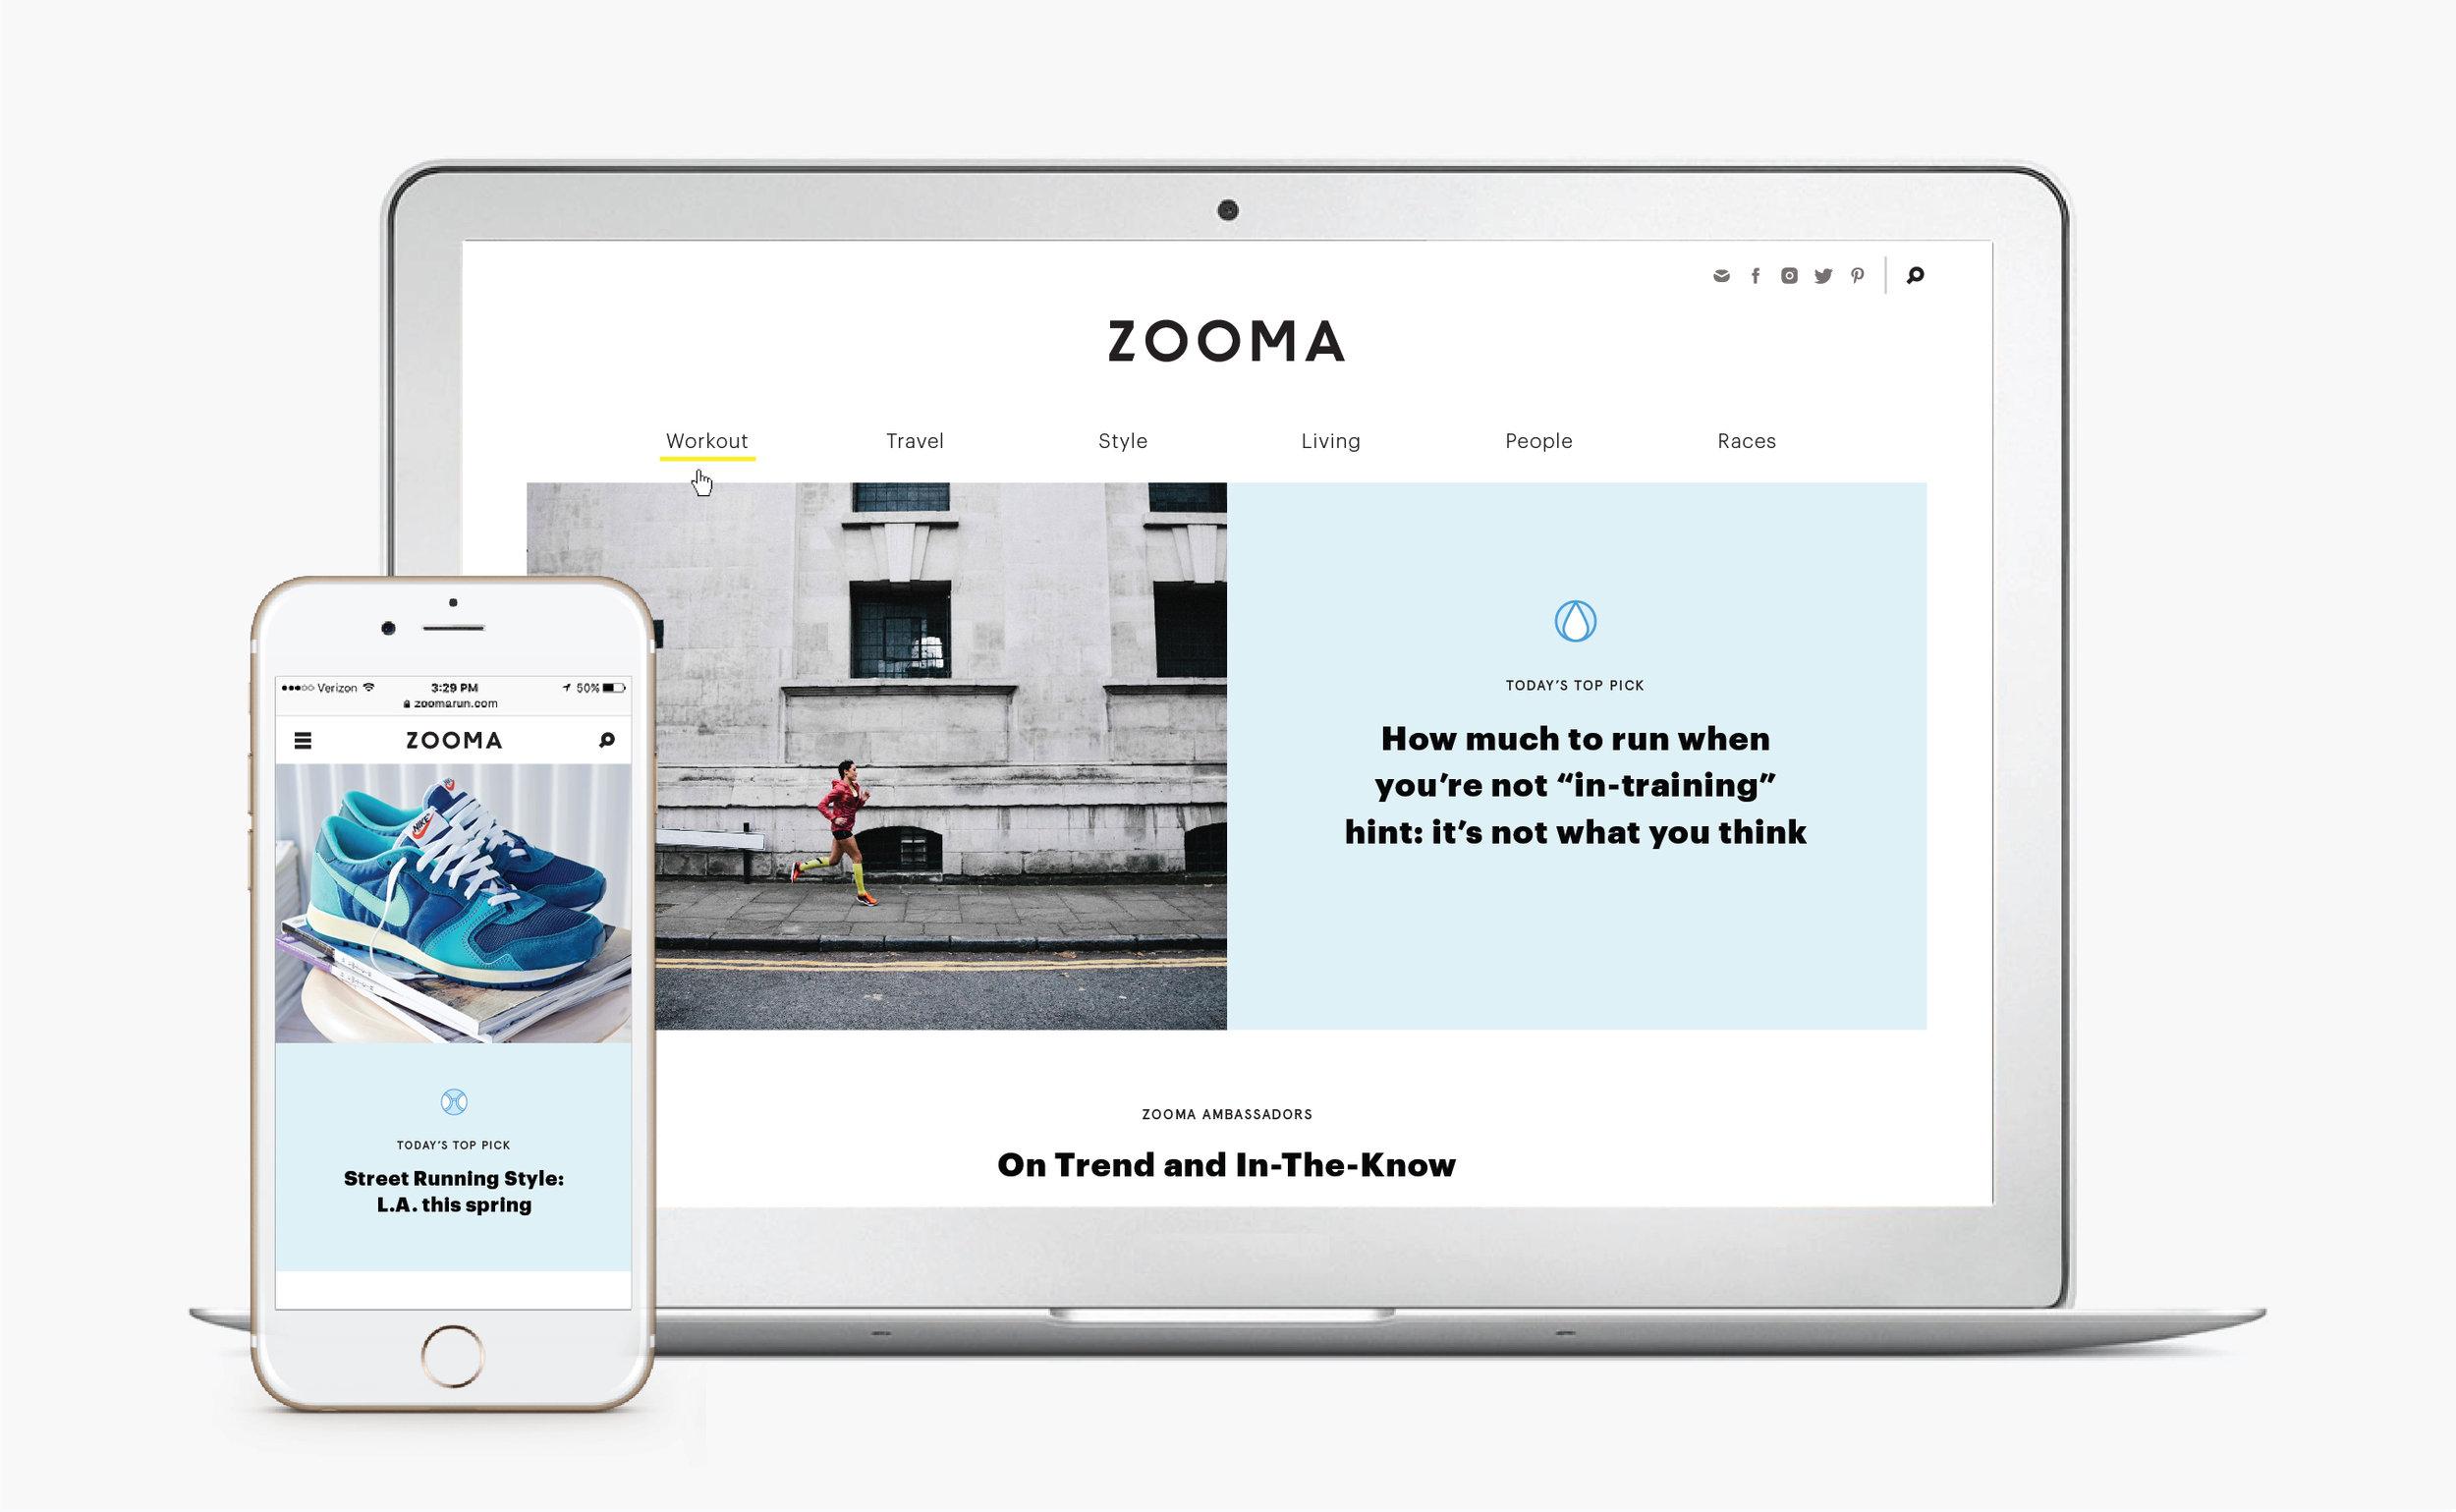 Zooma_website_aptone_NEW-06.jpg